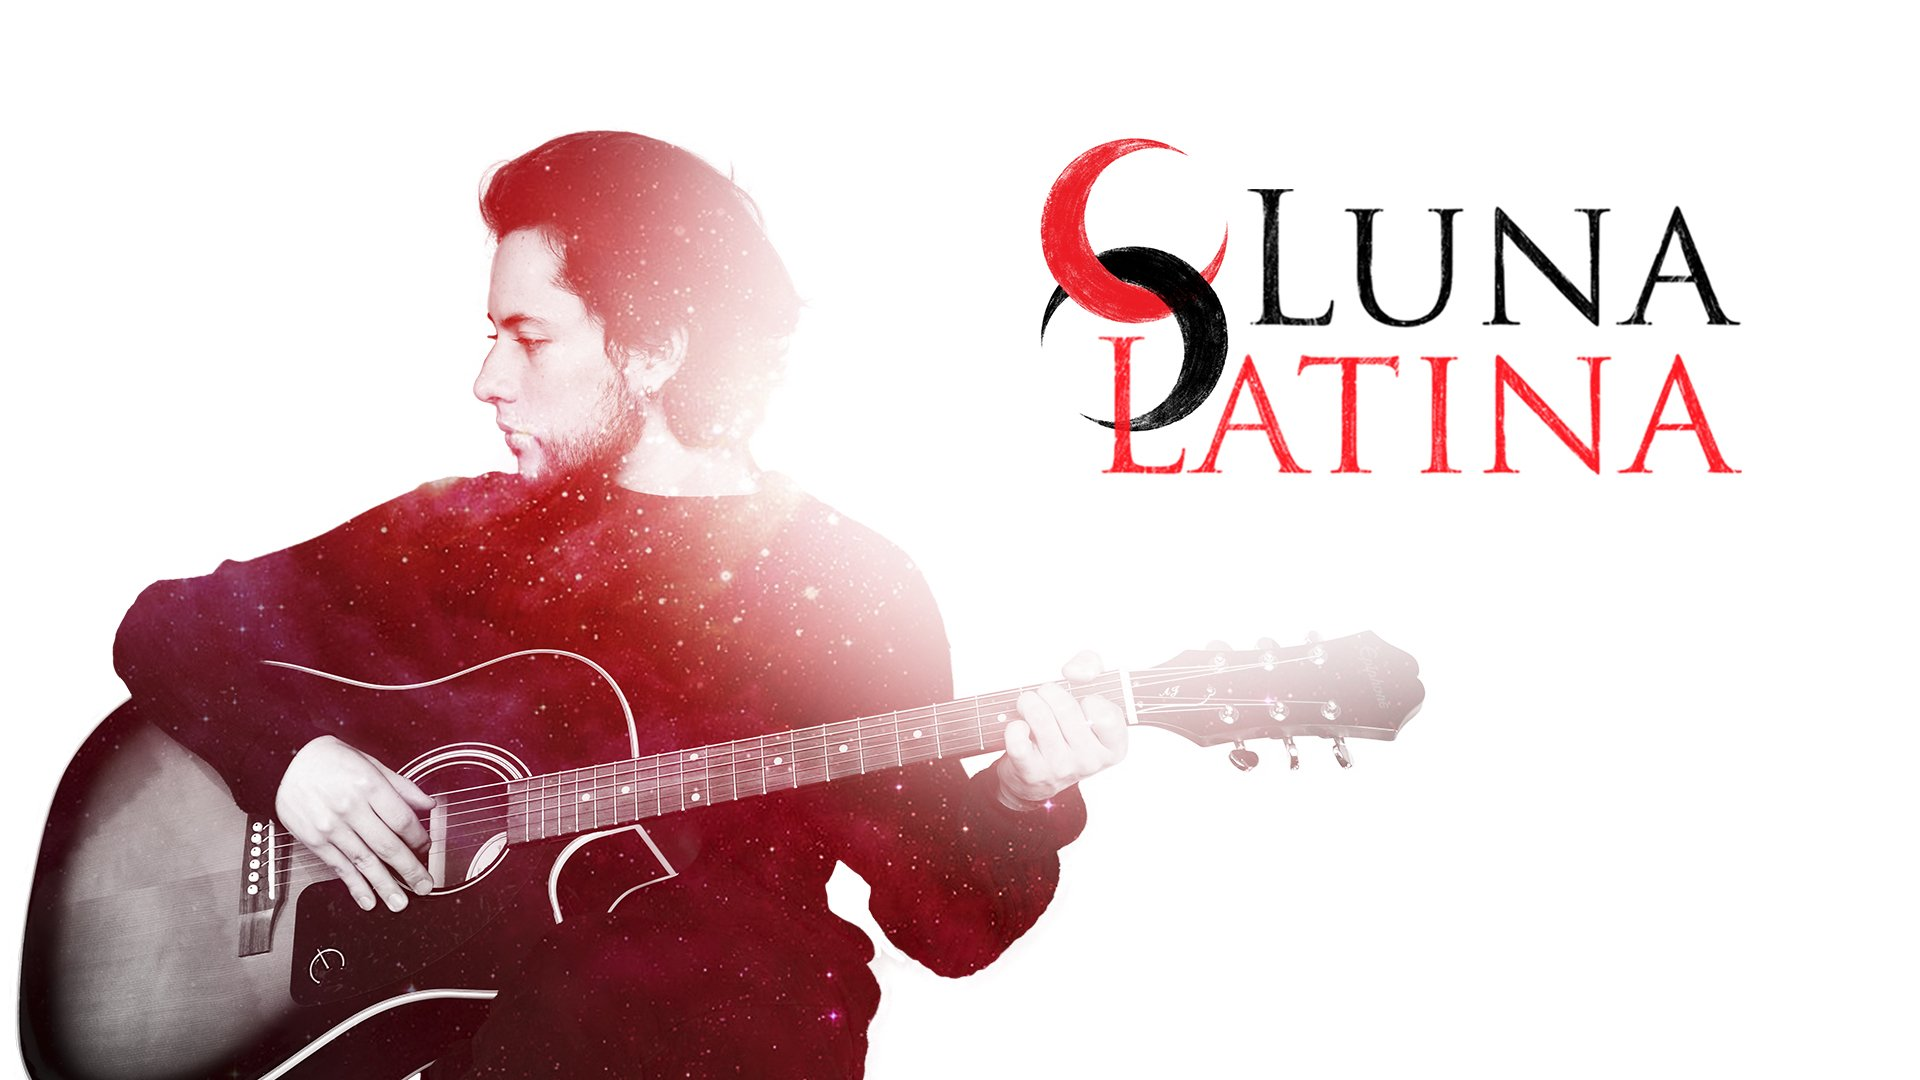 Luna Latina nuevo sencillo de Zomnia - FOTO-HORIZONTAL